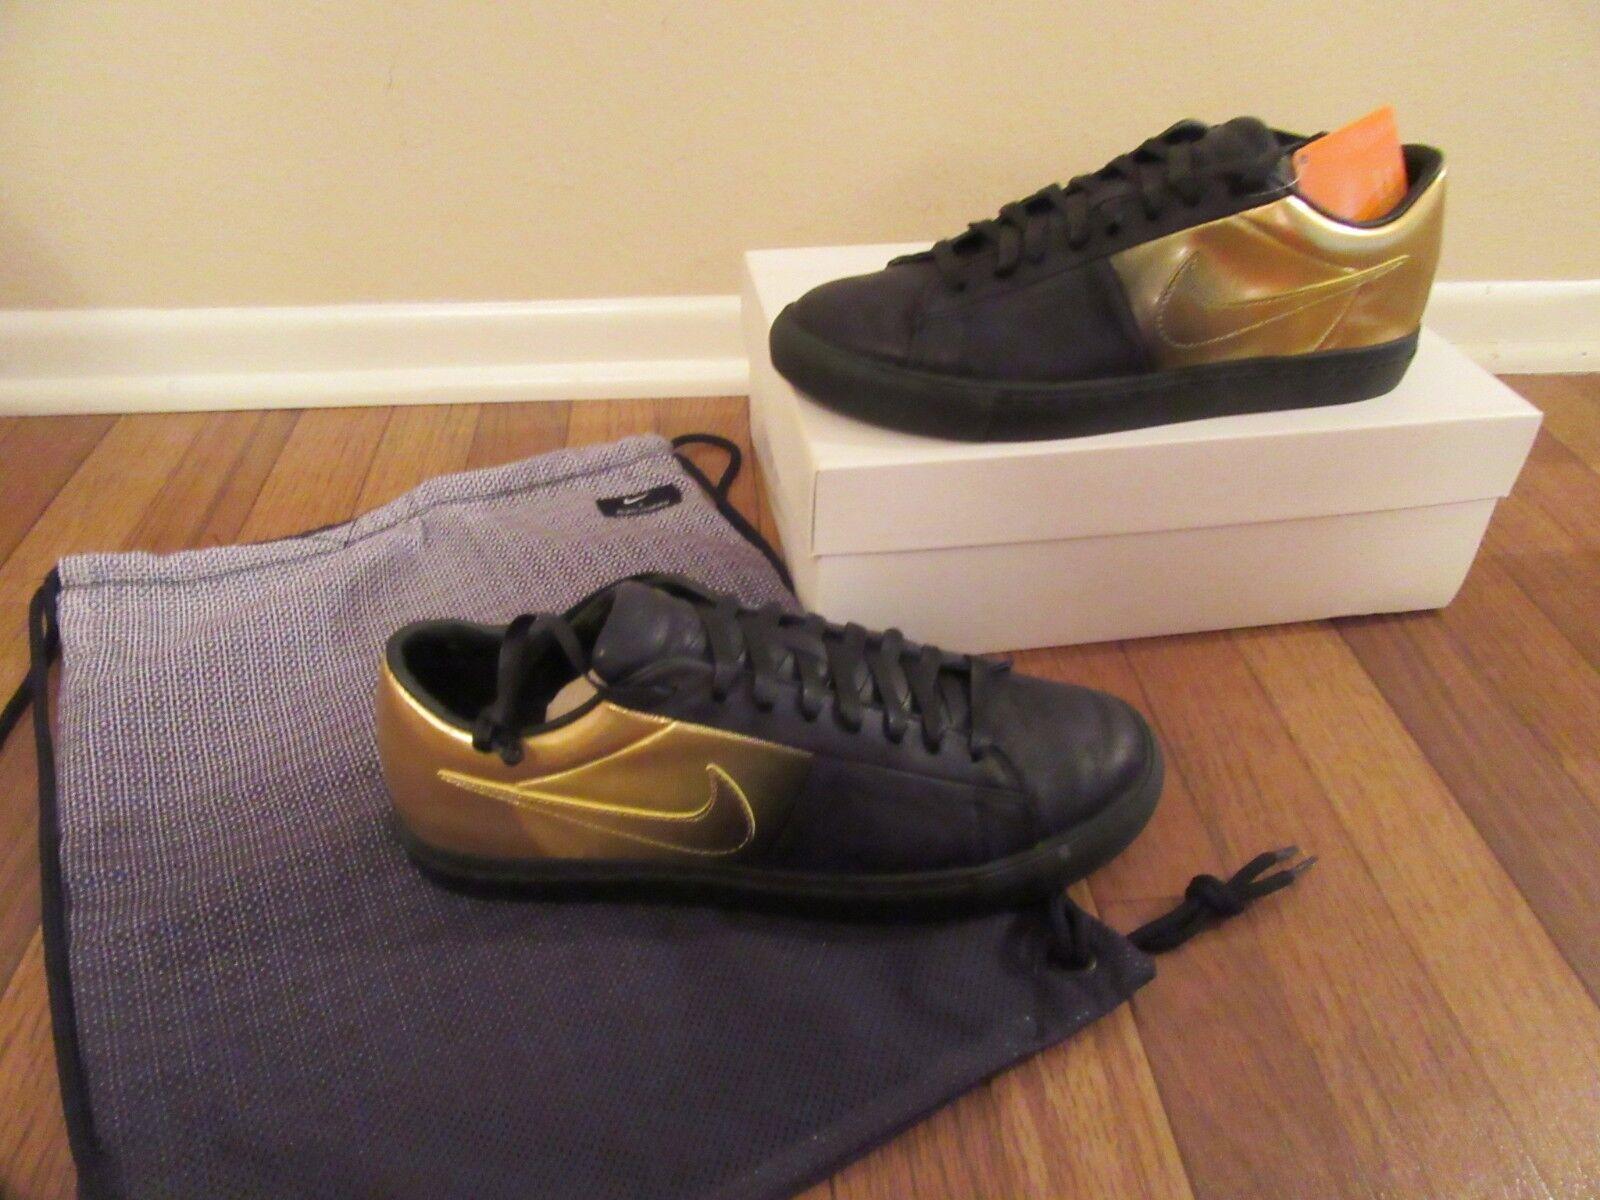 Nike Blazer Low SP / Pedro Lourenco 718798 Size 11.5 Black Gold 718798 Lourenco 008 Brand New DS 3814ab